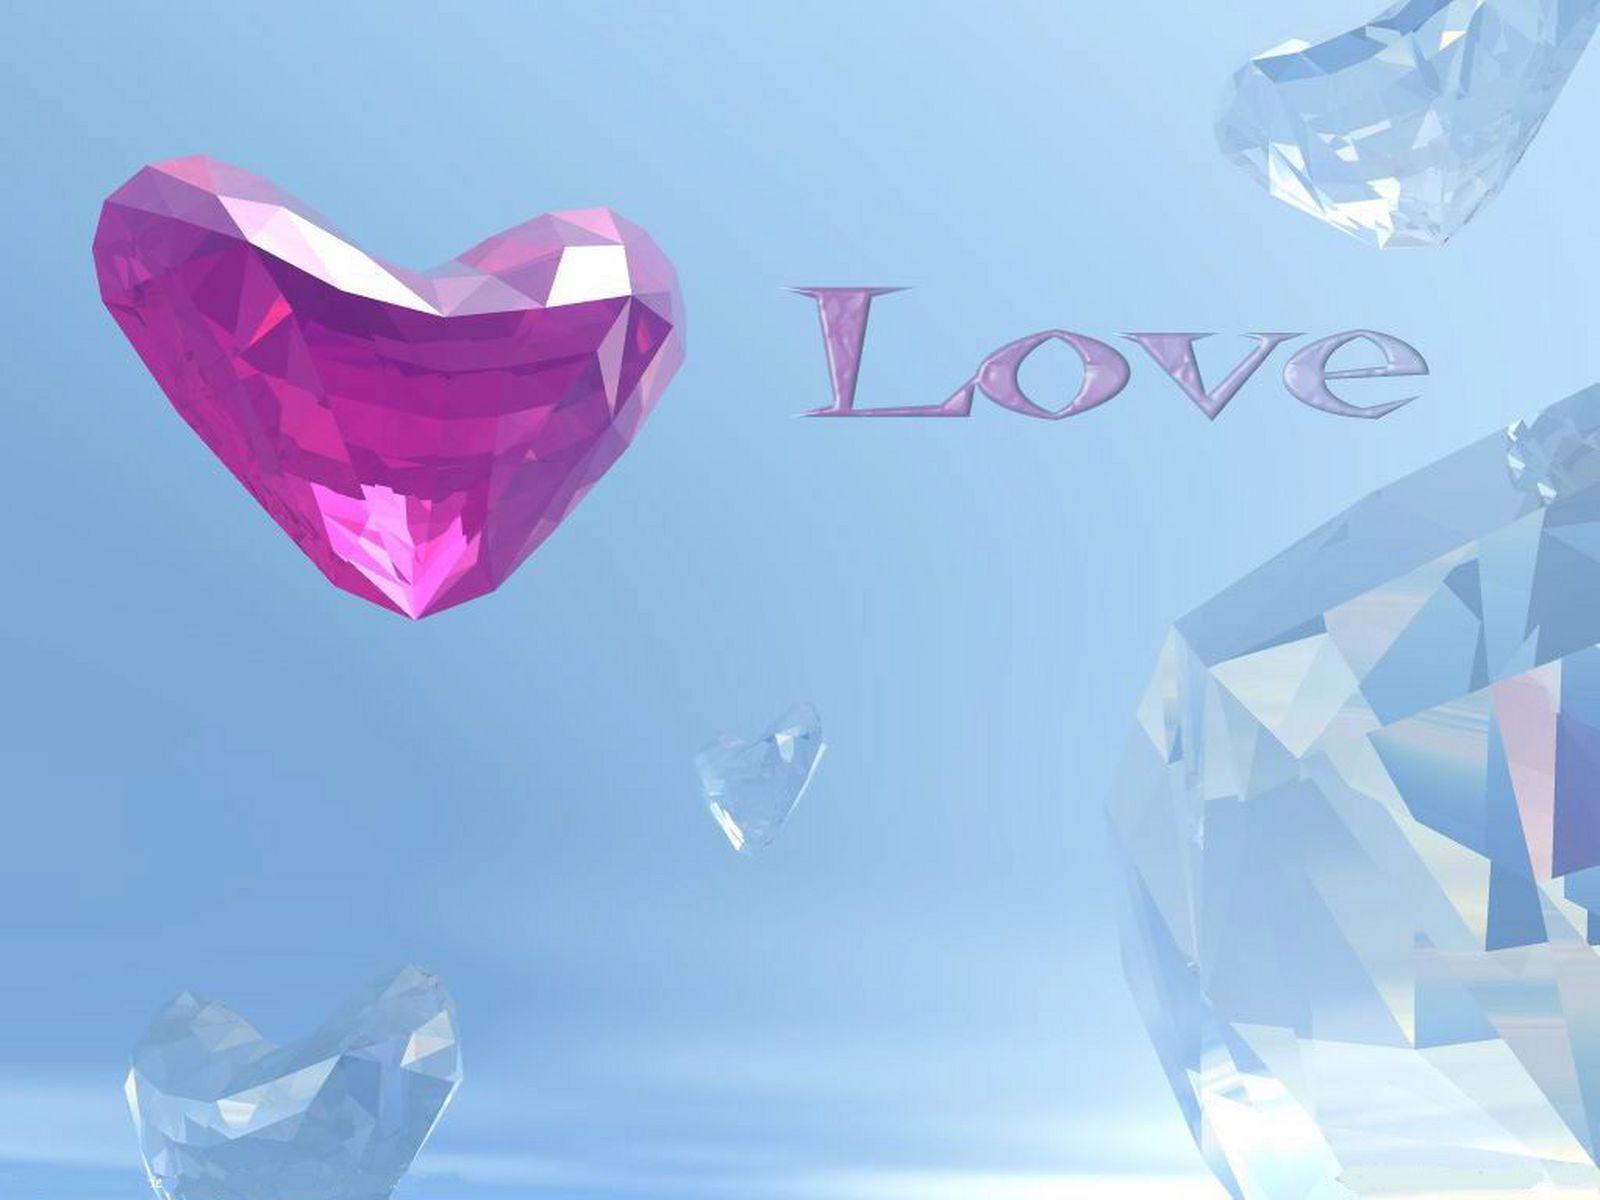 http://2.bp.blogspot.com/-ETAcRs_R388/UGRcfZaOhDI/AAAAAAAAAG4/0v54U0tHDH4/s1600/Love-Wallpaper-love-2939260-1600-1200.jpg